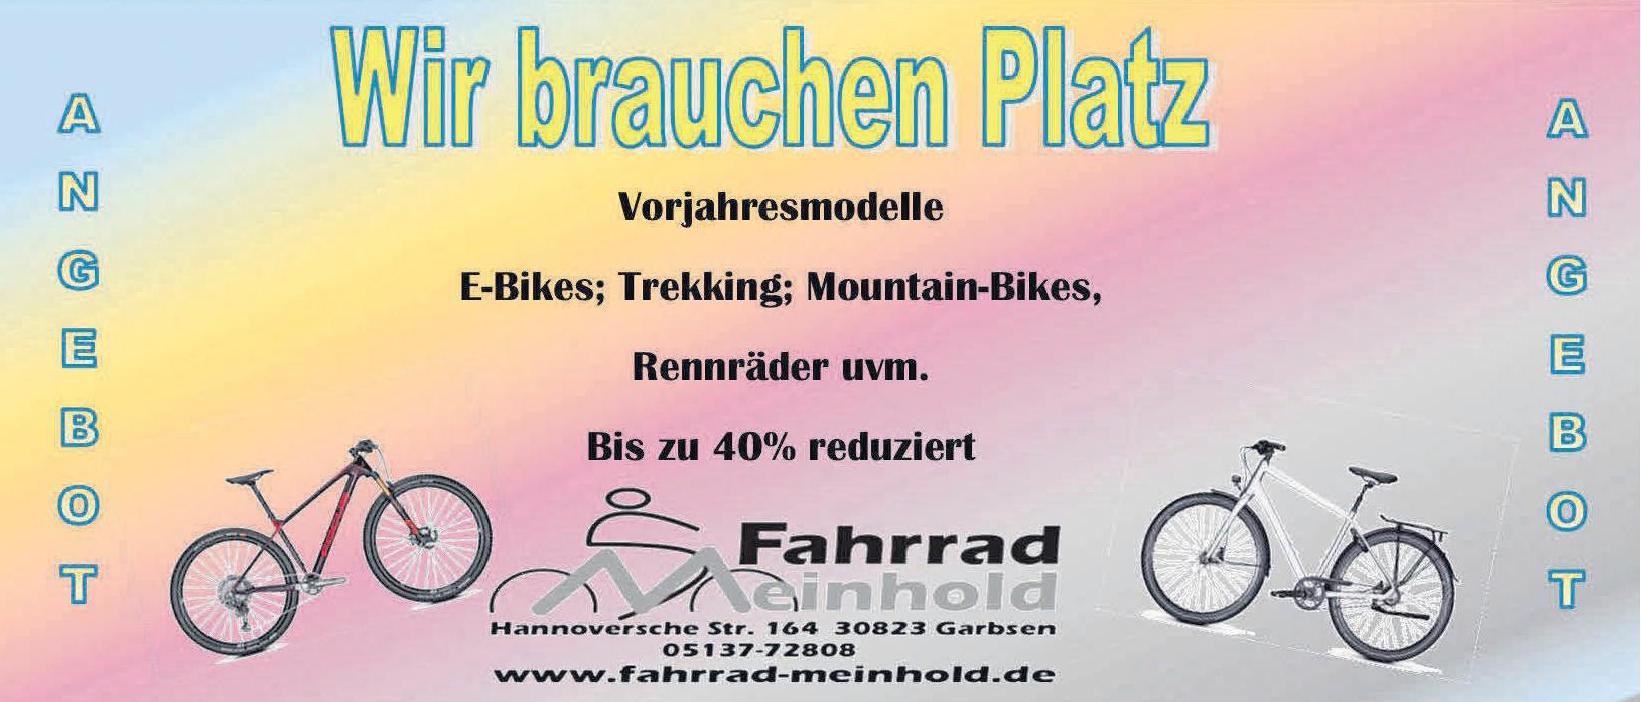 Fahrrad Meinhold